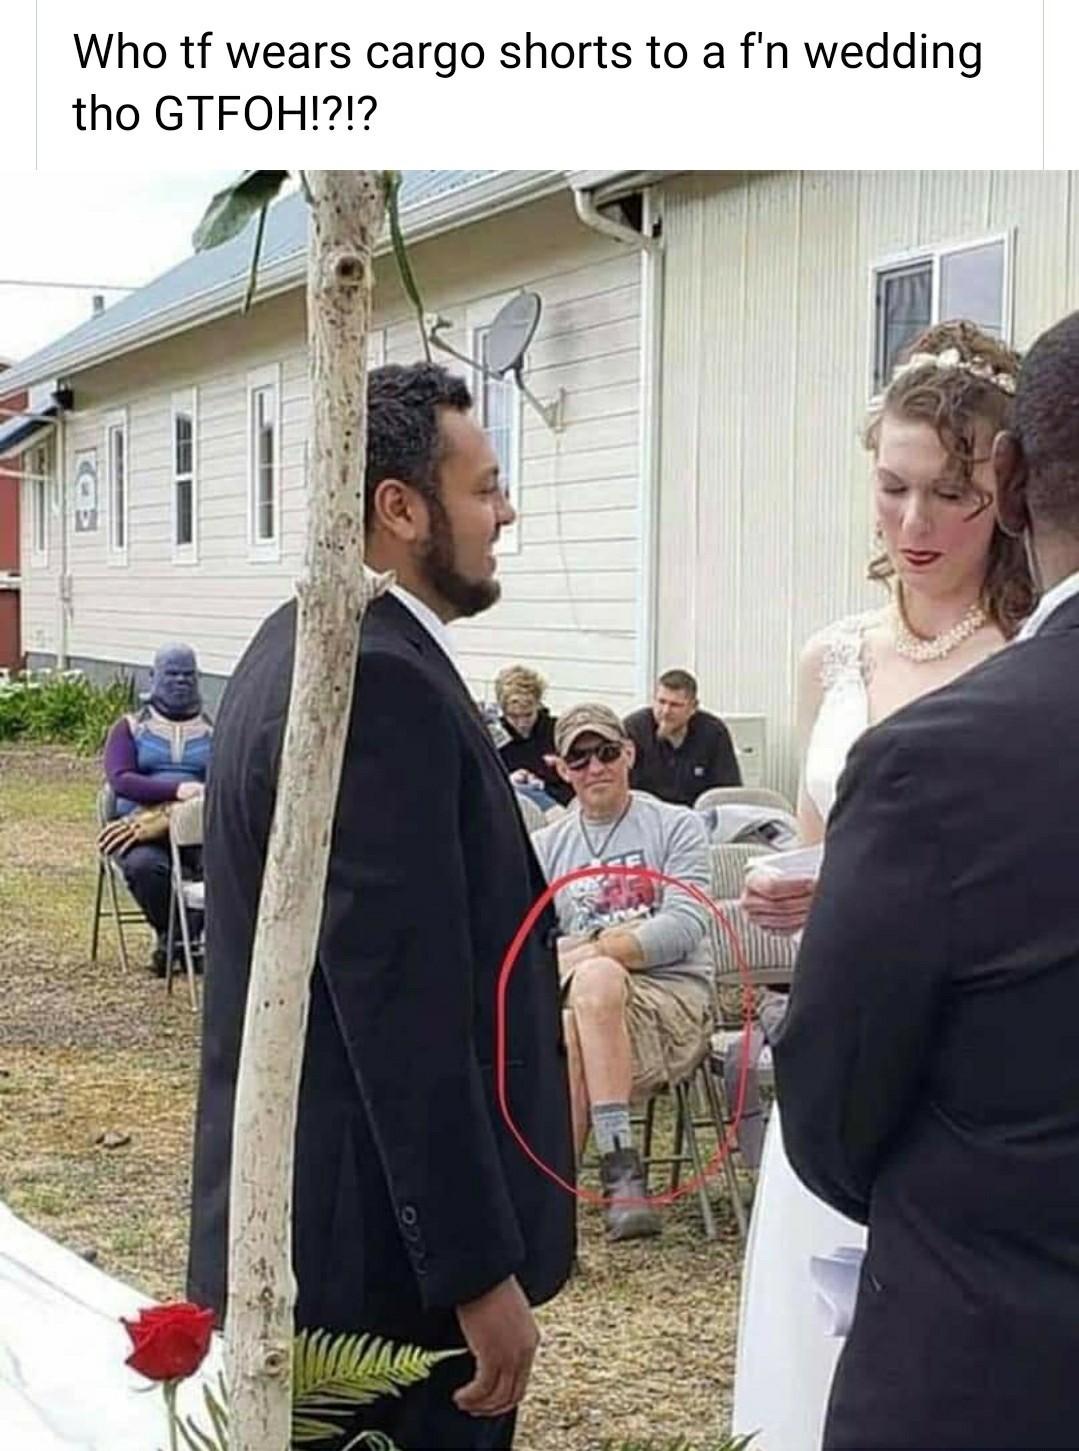 Never wear cargo shorts to a wedding - meme